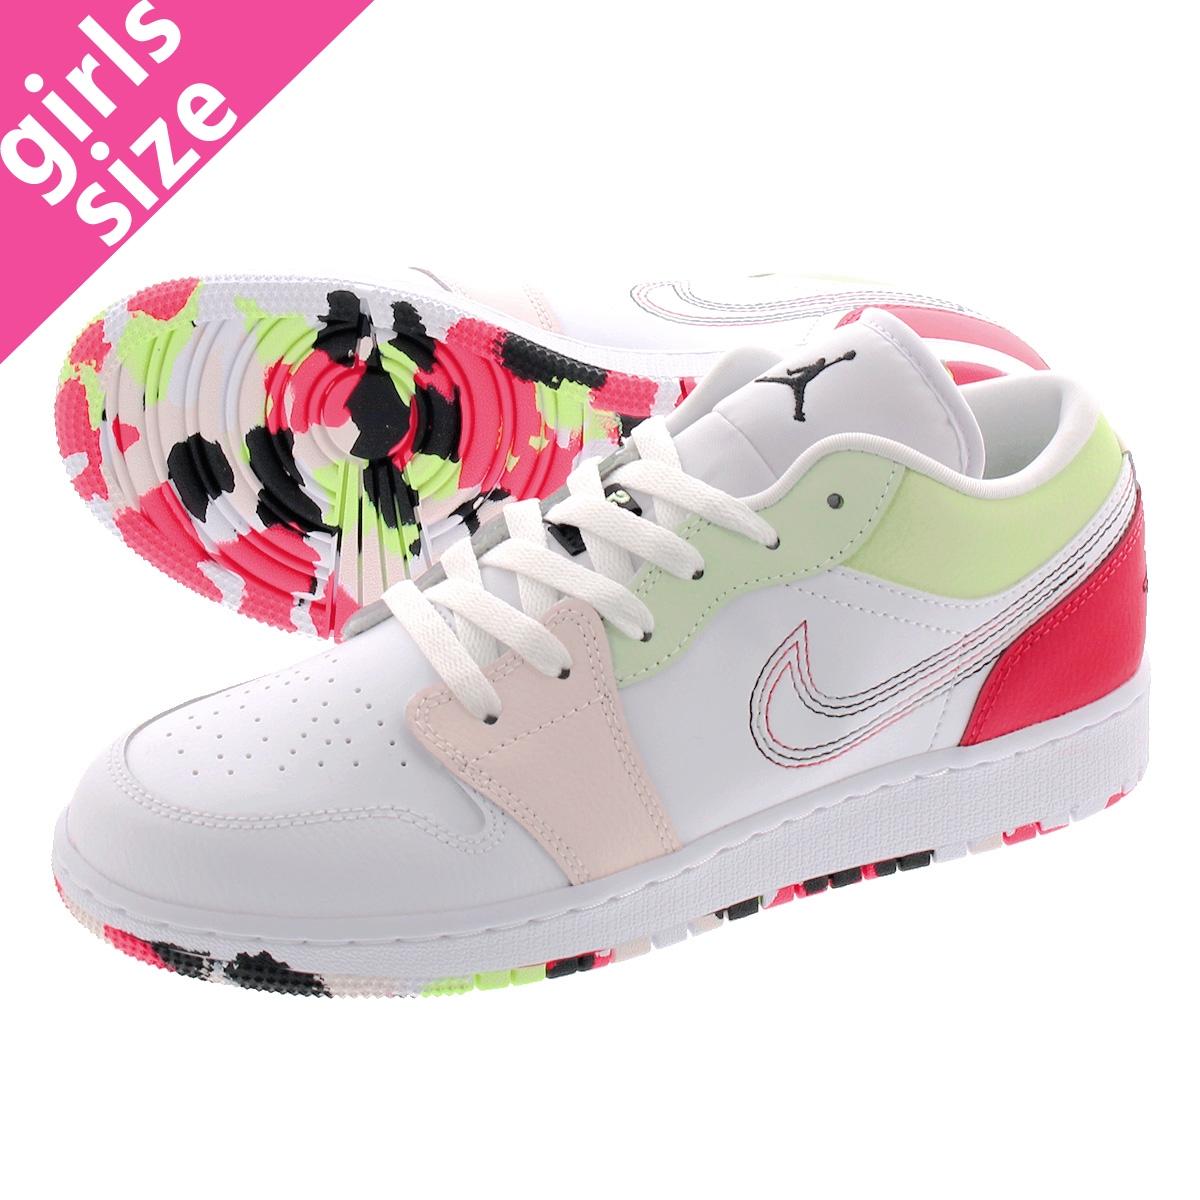 Nike Air Jordan 1 Low GS White Ember Glow Barely Volt 554723 176